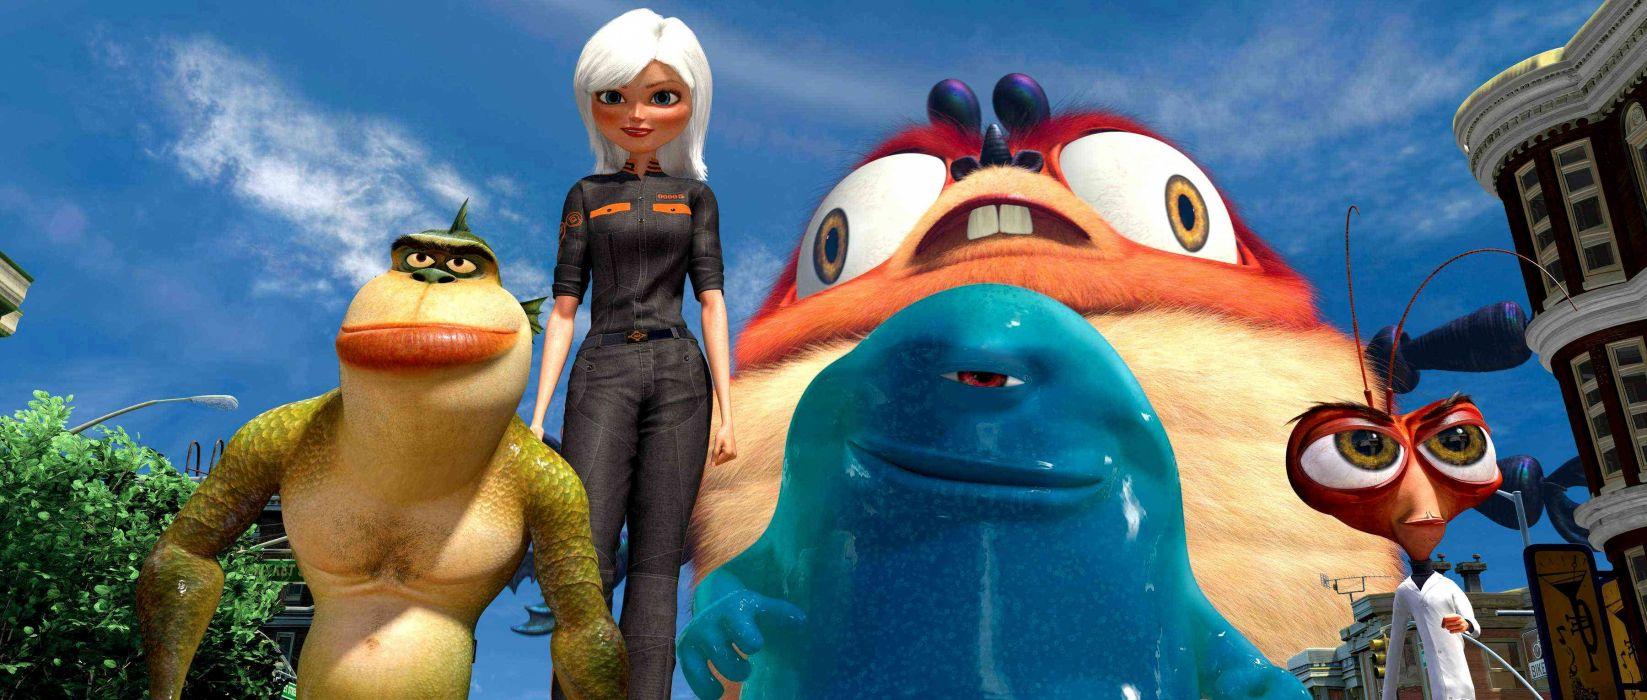 MONSTERS-VS-ALIENS cartoon animation sci-fi monsters aliens monster alien film movie (24) wallpaper